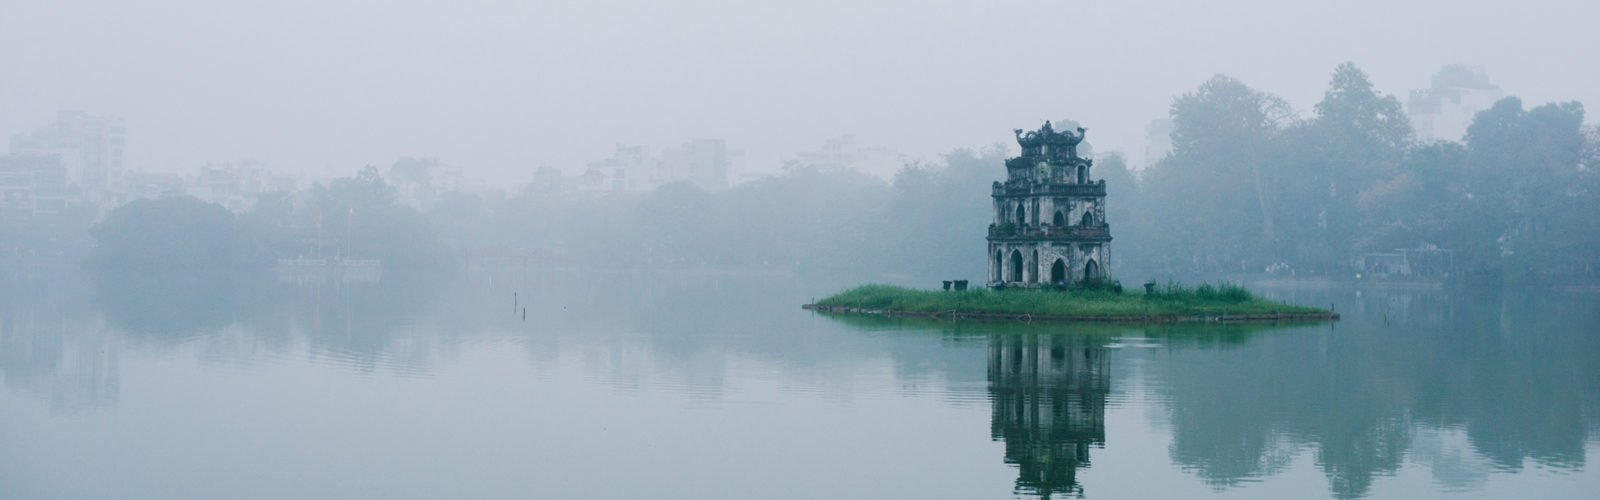 hanoi-turtle-tower